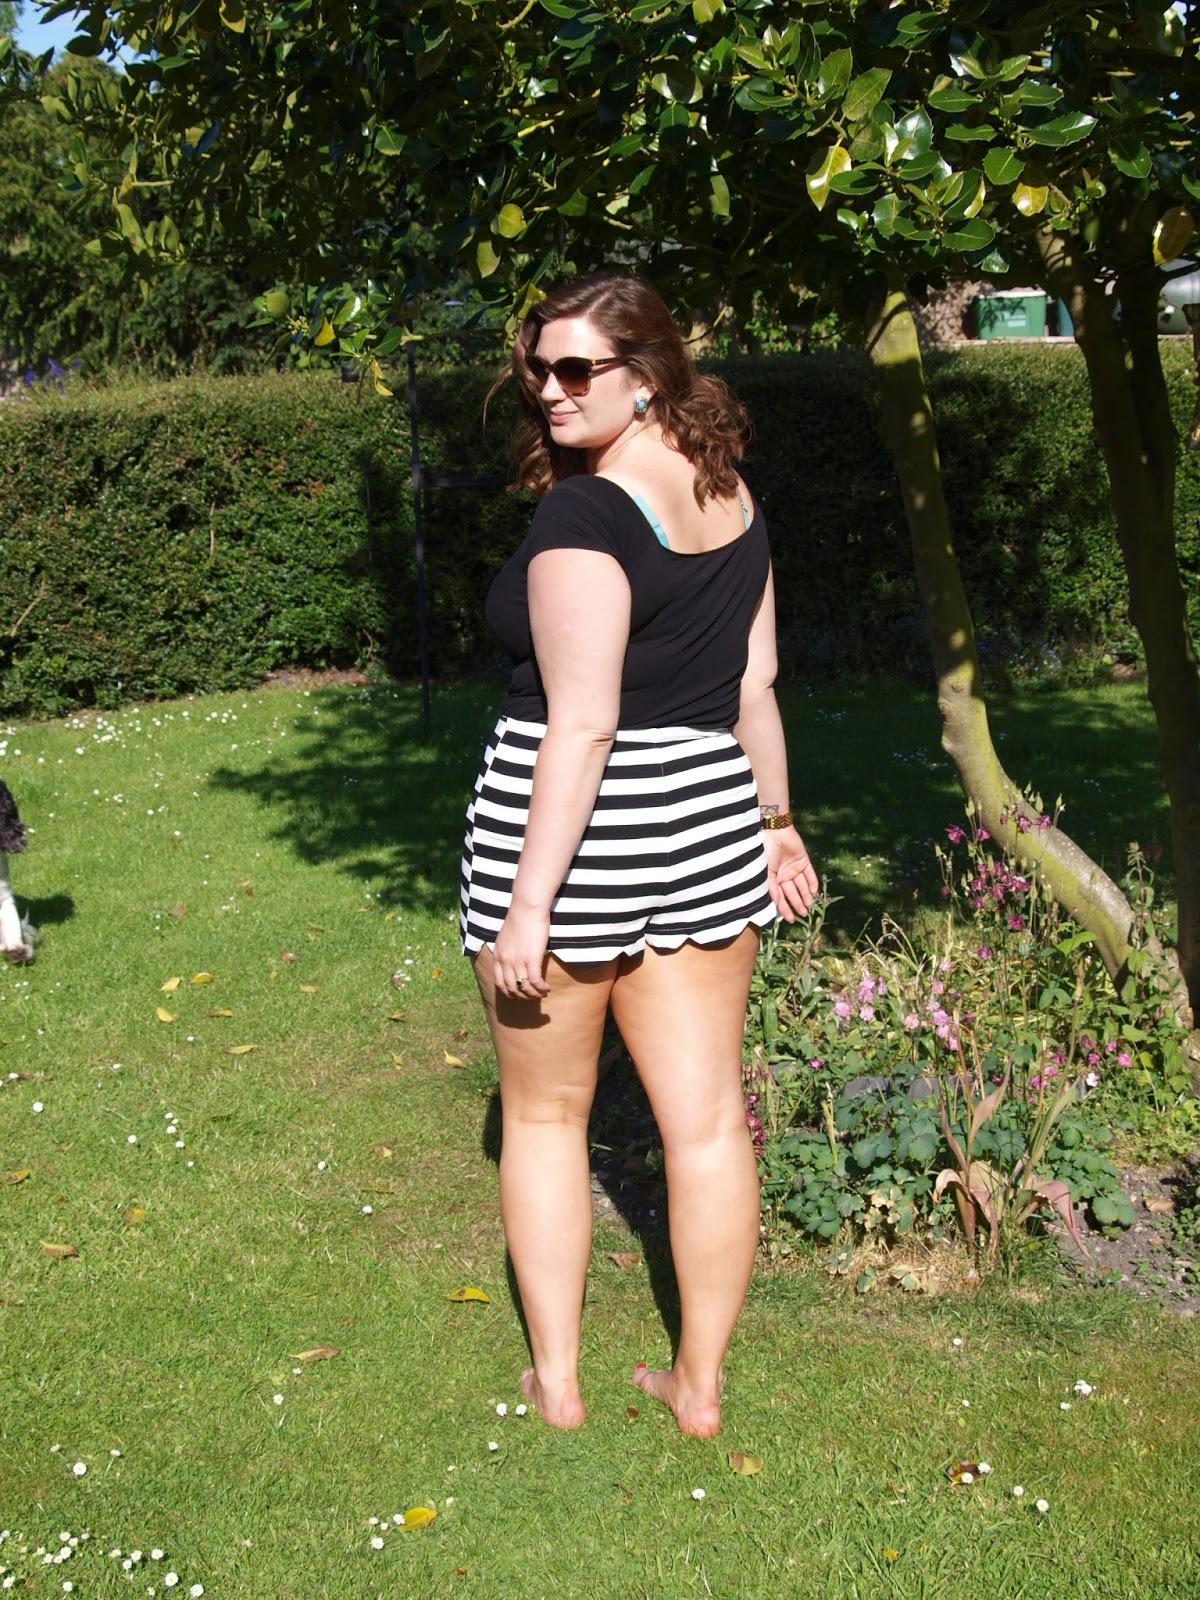 Curvy Girl Thin: Breaking all the *ahem* rules!